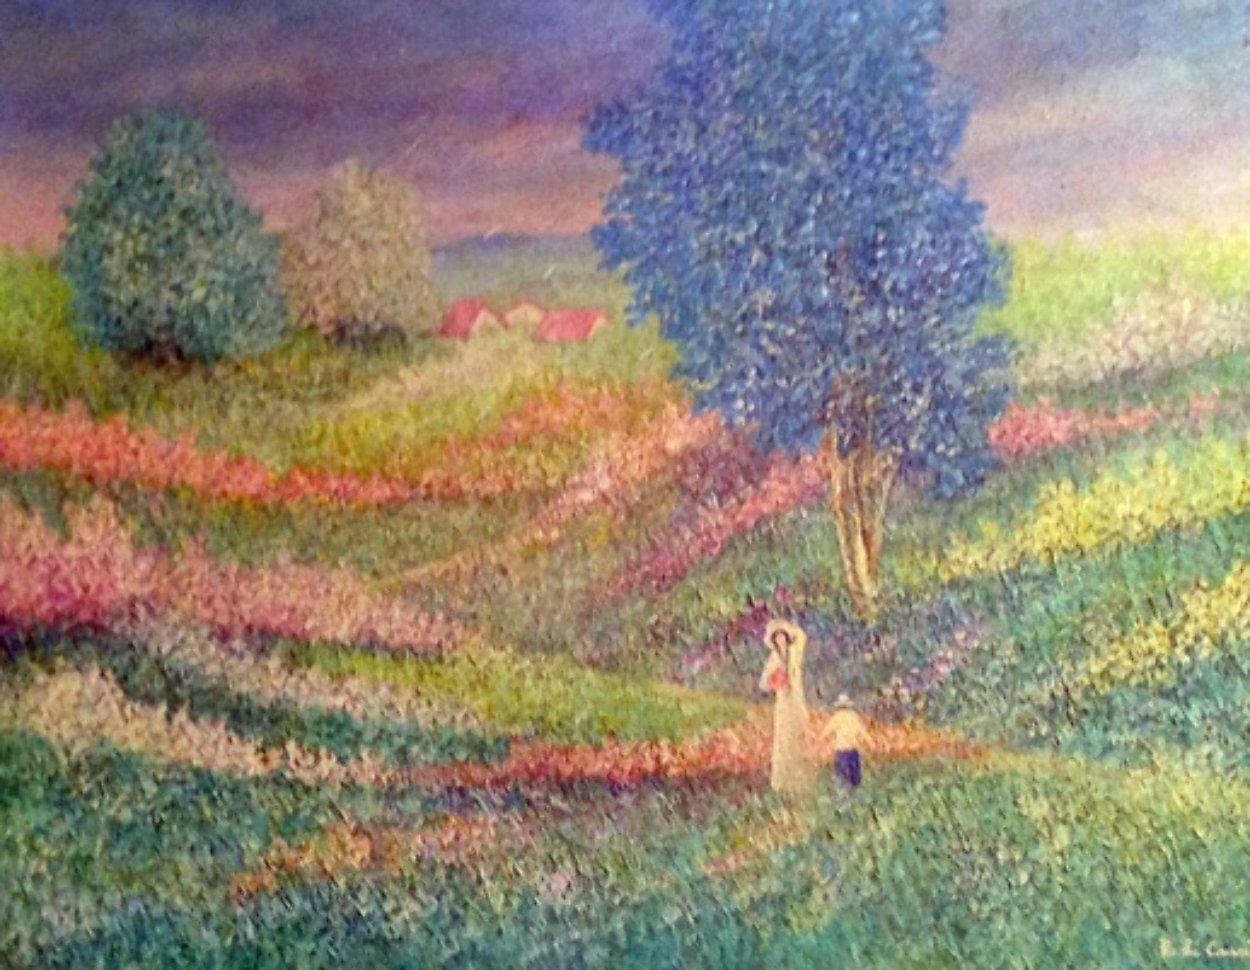 Momento di Pace (Moment of Peace) 1985 38x48 Super Huge Original Painting by Rino Li Causi